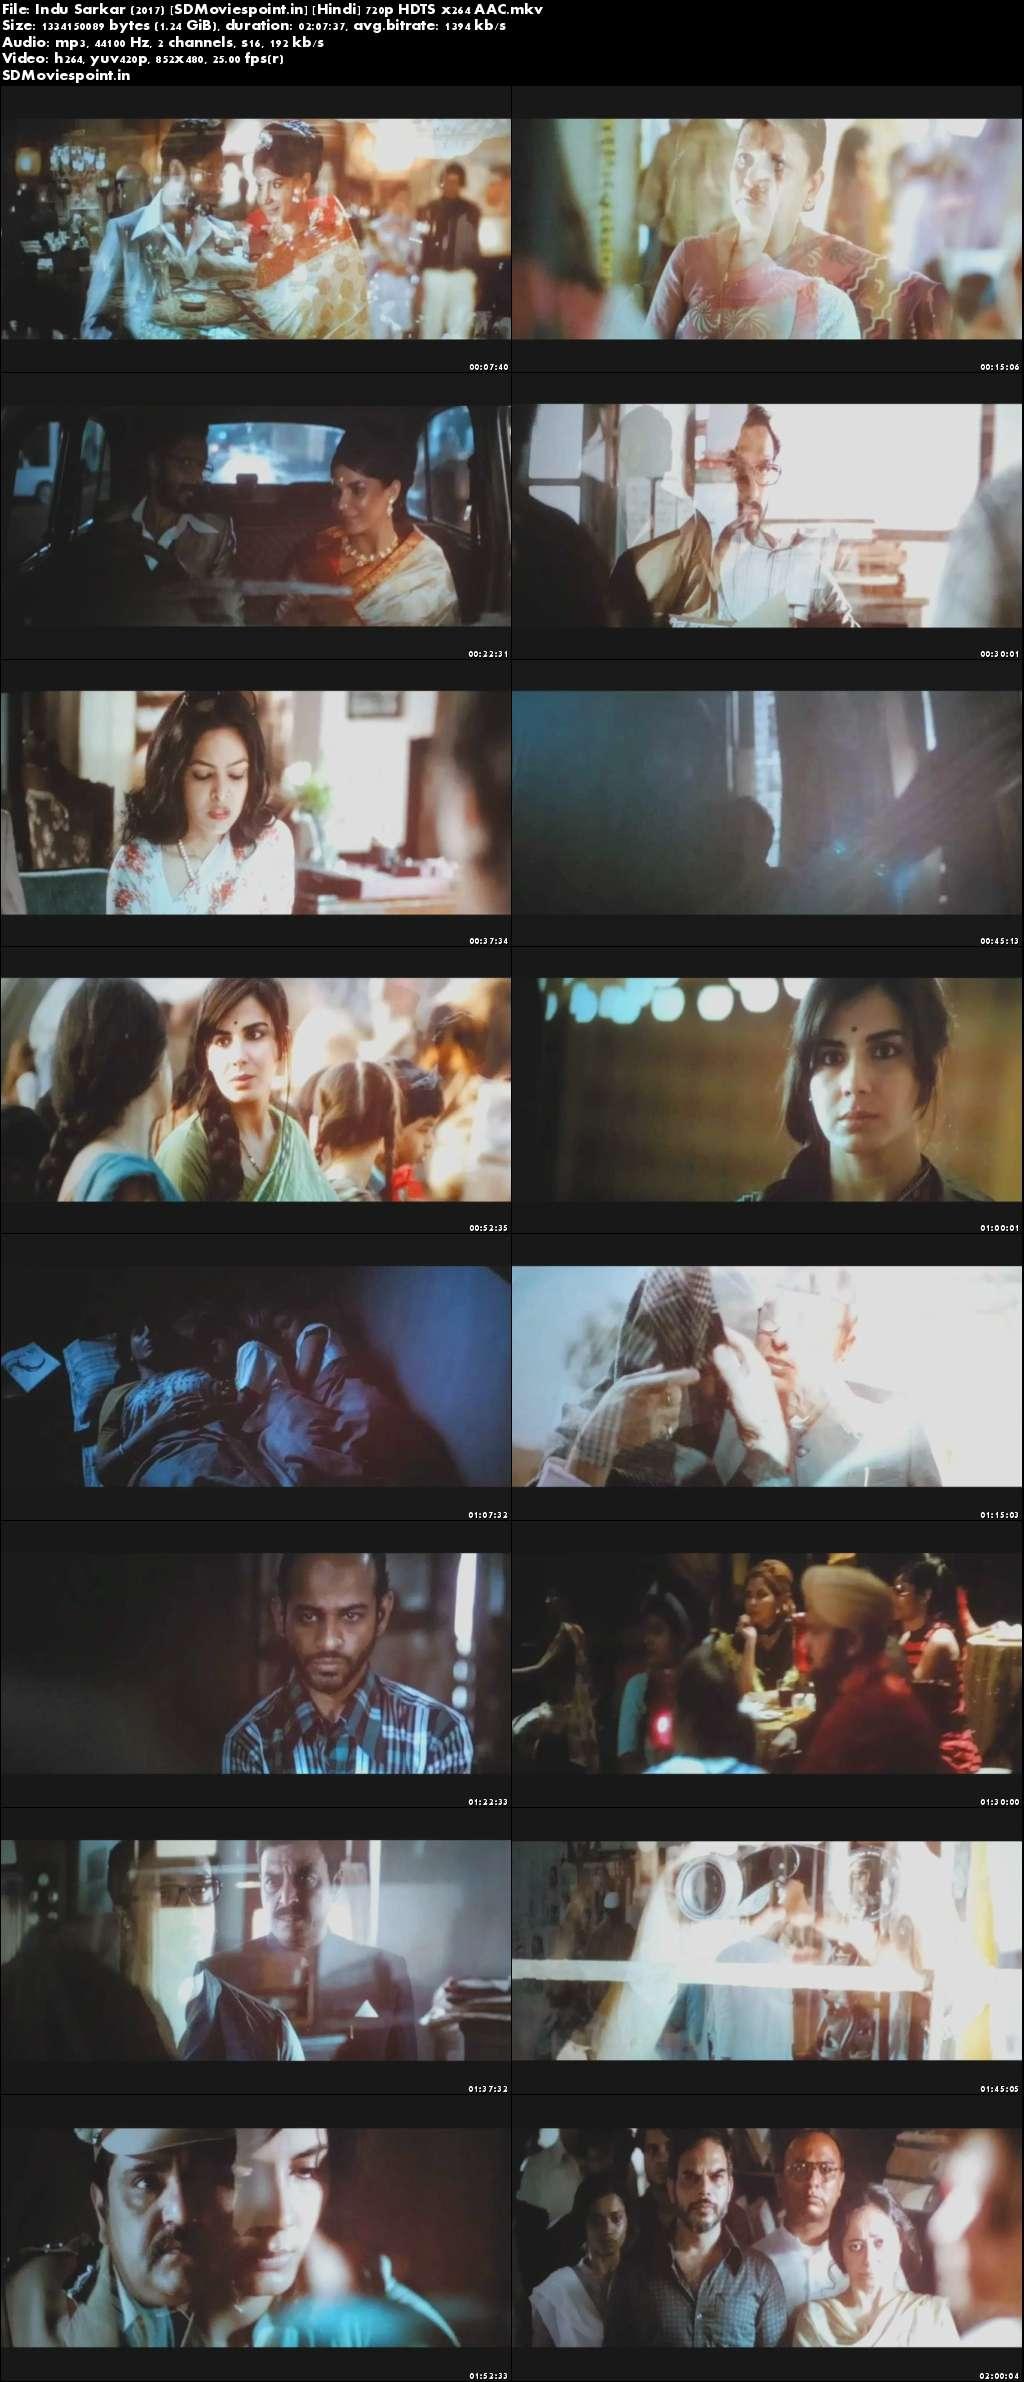 Screen Shots Indu Sarkar (2017) Full HD Movie Download 720p